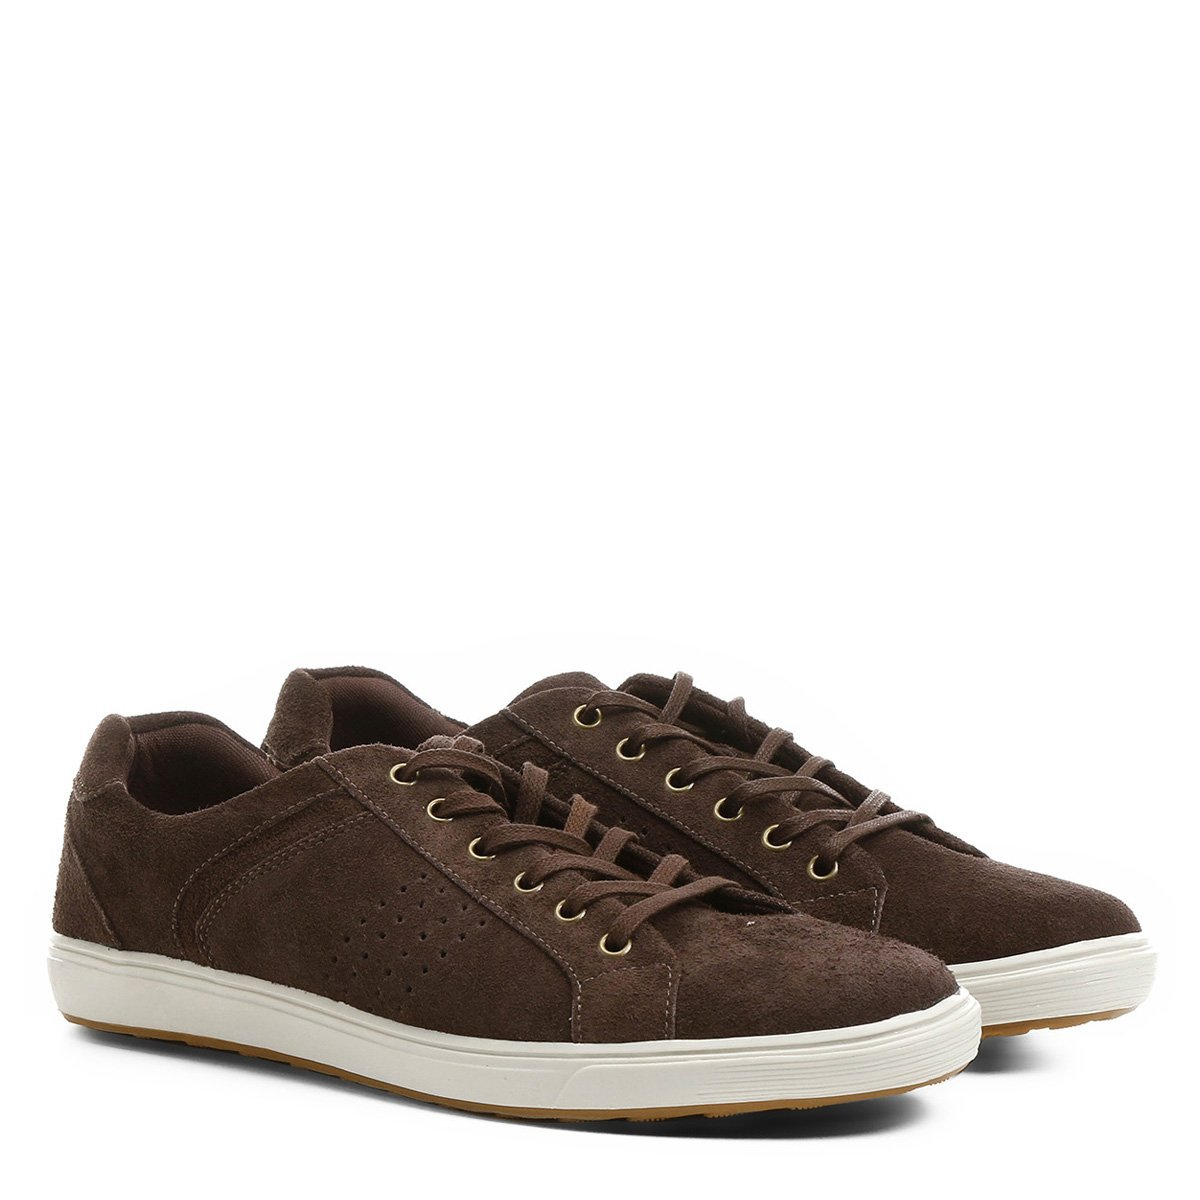 5addb27a6d9 Sapatênis Couro Shoestock Perfuros Masculino - Compre Agora